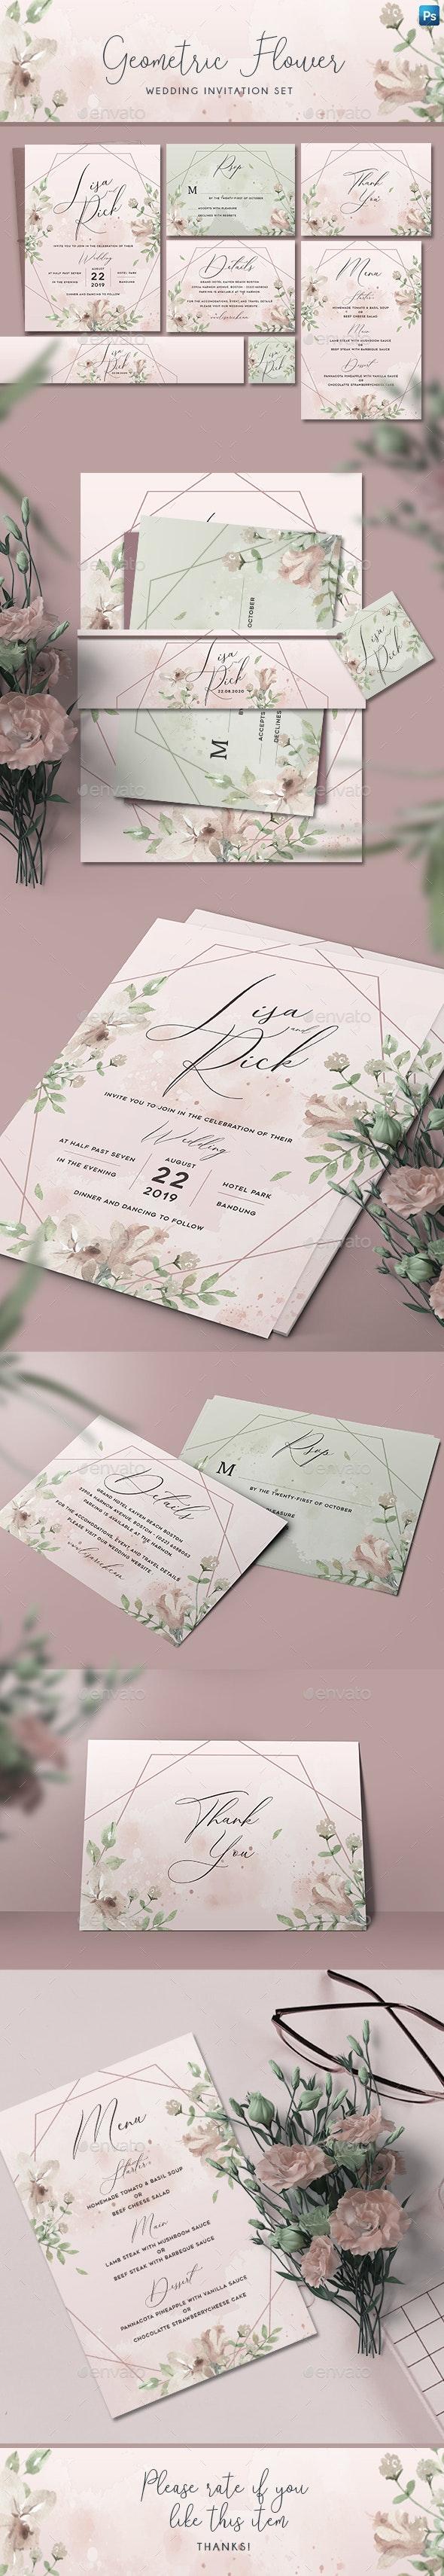 Geometric Flower Wedding Invitation - Weddings Cards & Invites